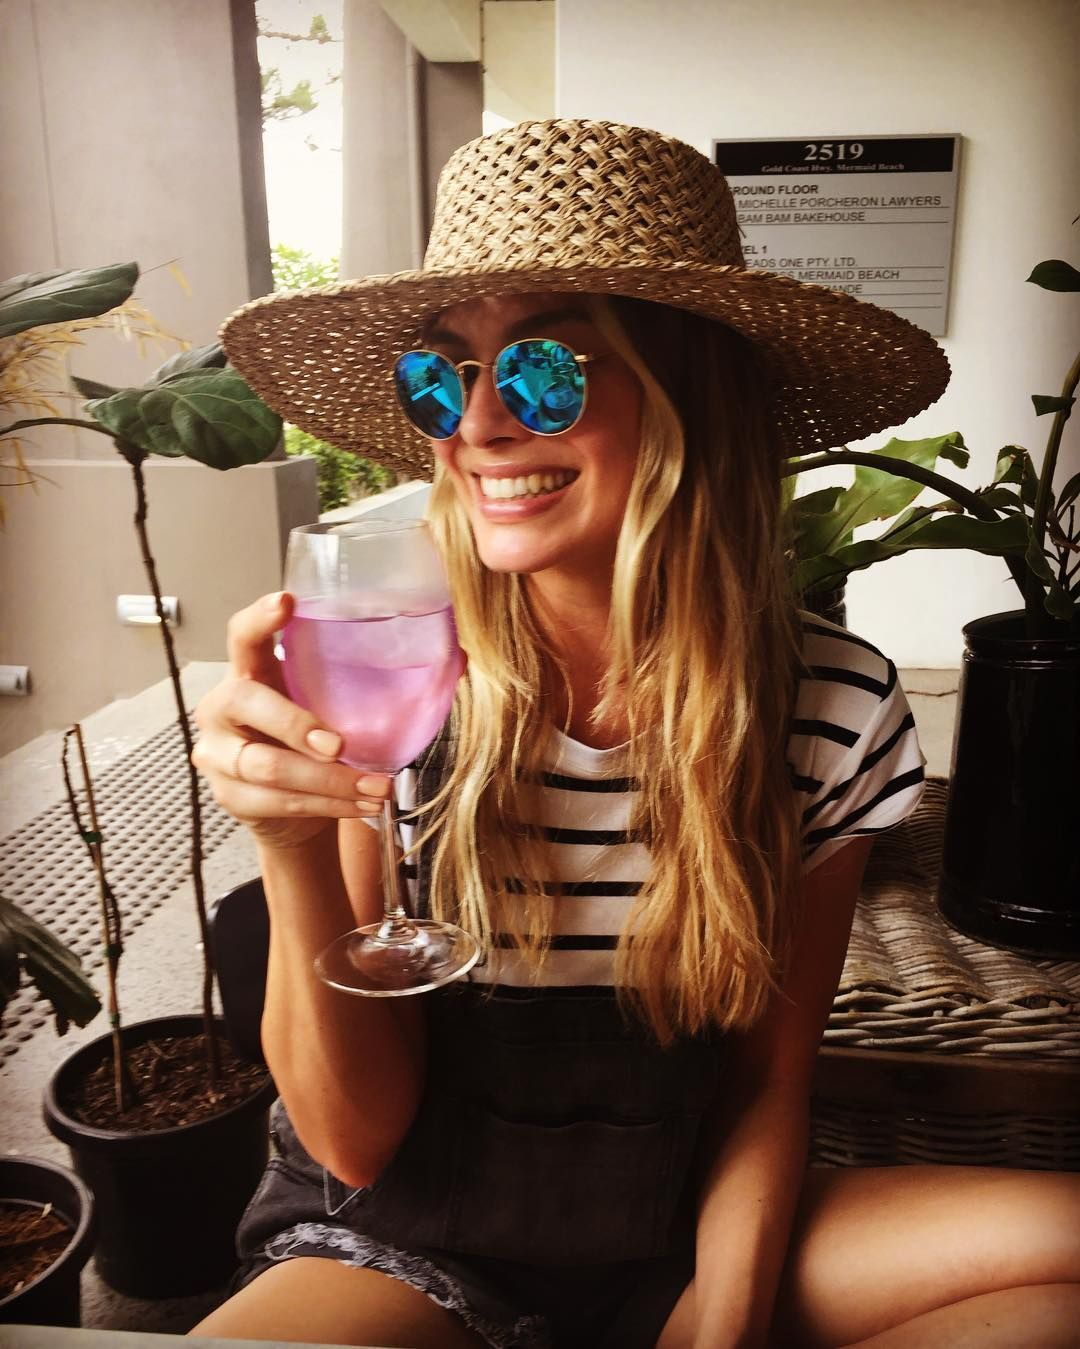 Margot Robbie Margo robbie, Estilo de fotos, Poses de moda